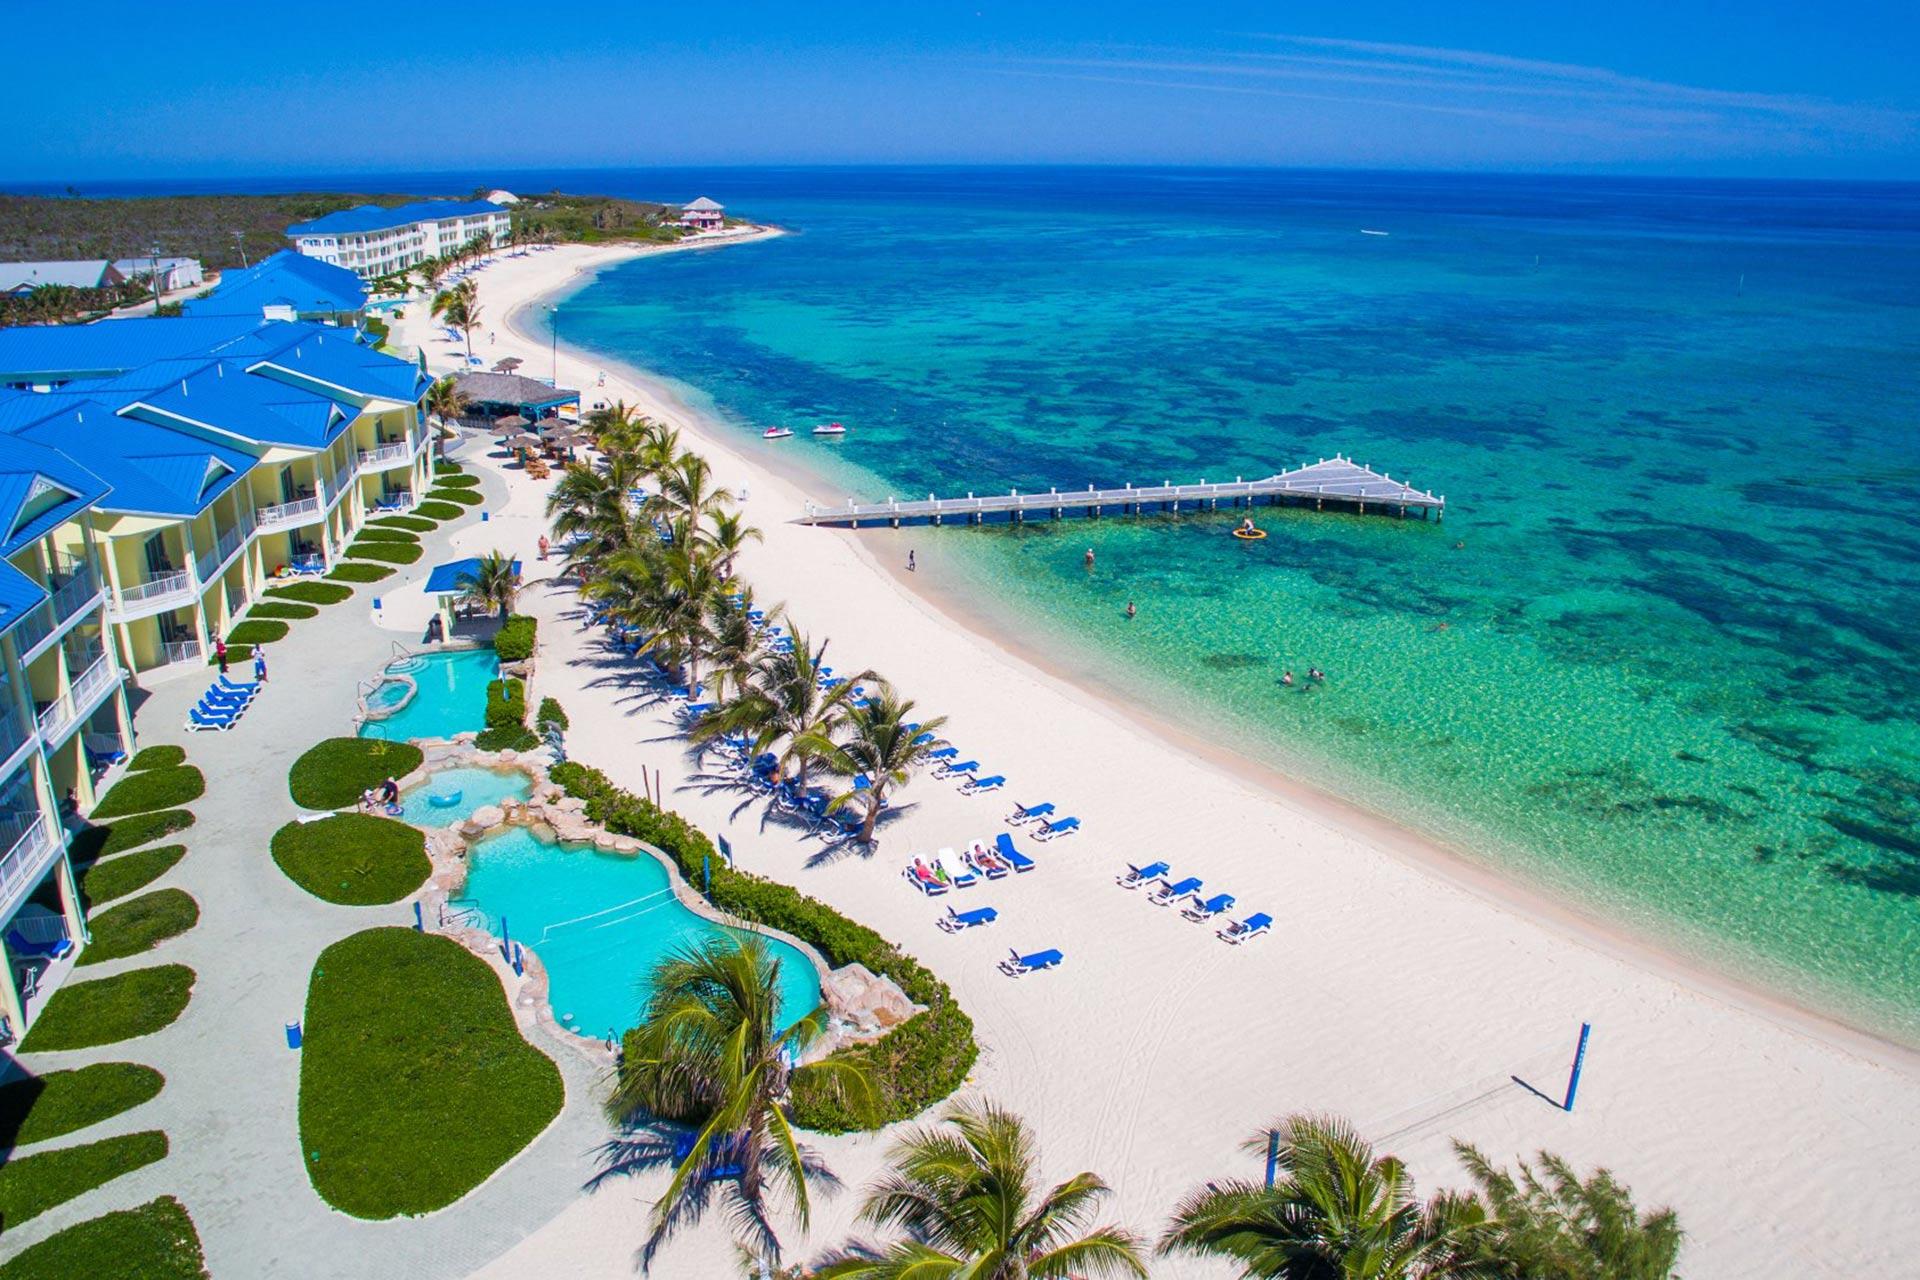 Wyndham Reef Resort in Cayman Islands; Courtesy of Wyndham Reef Resort